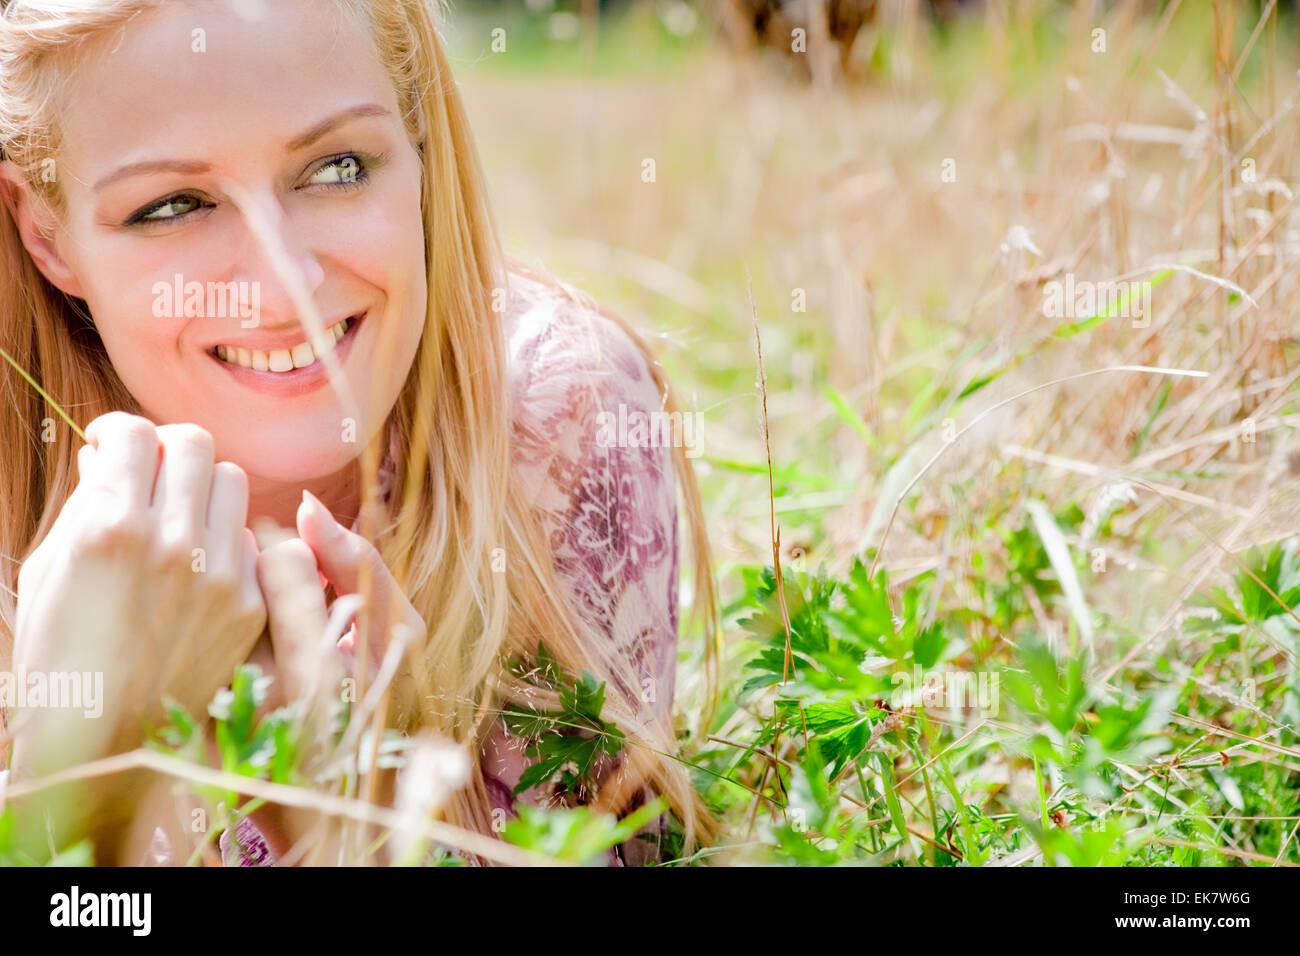 Estilo de vida feliz chica Imagen De Stock